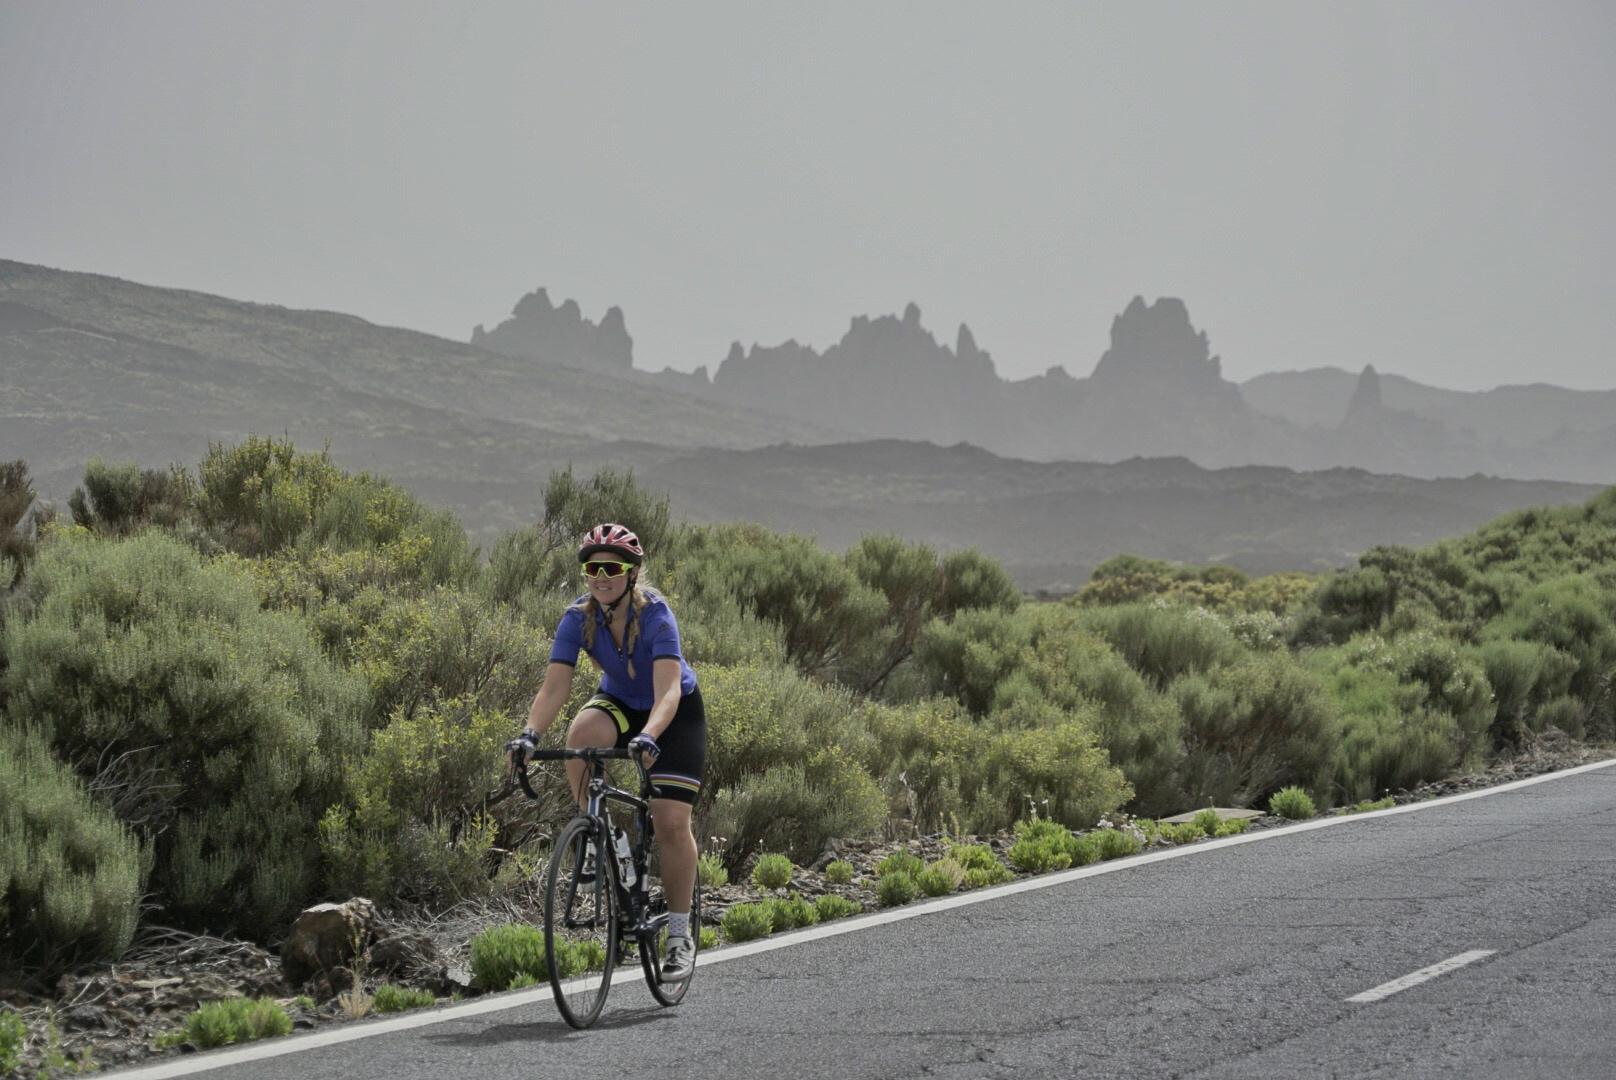 Vist Tenerife: Sophie Radcliffe Adventures One Life Live it